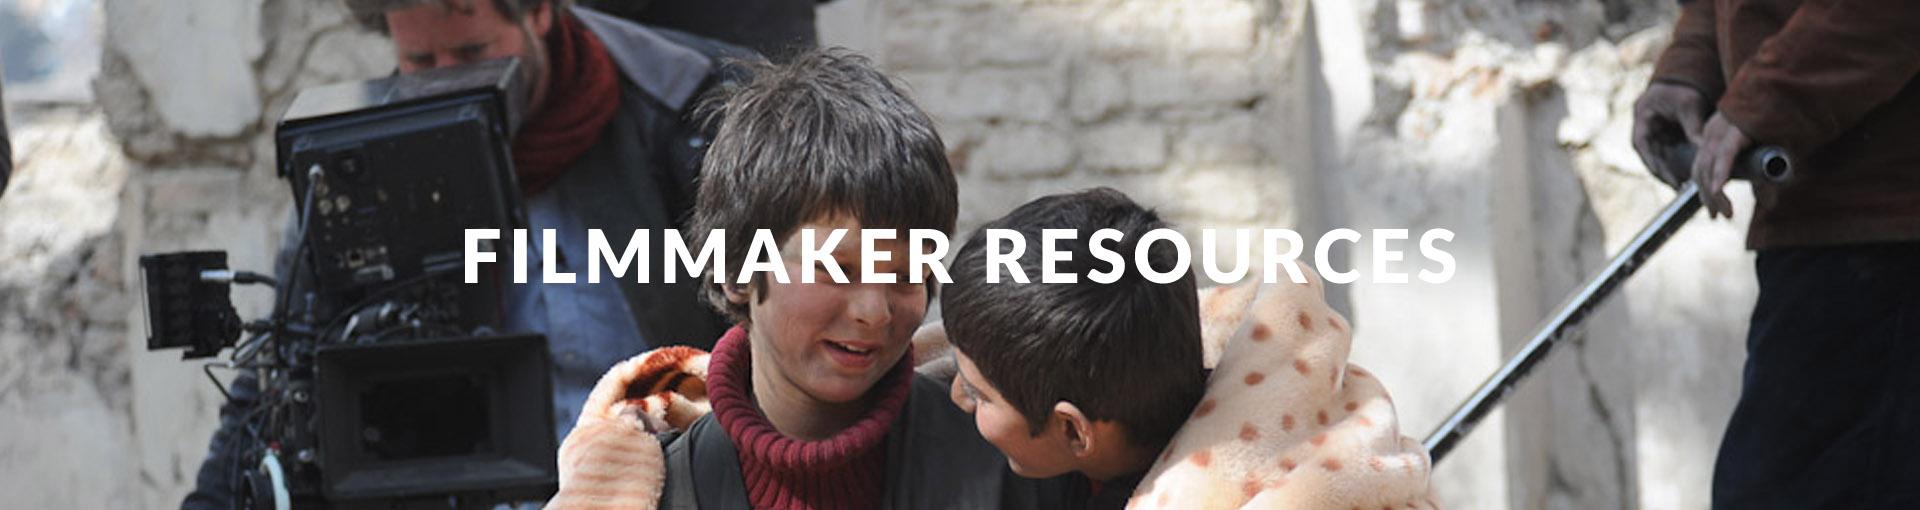 banner_filmmaker_resources